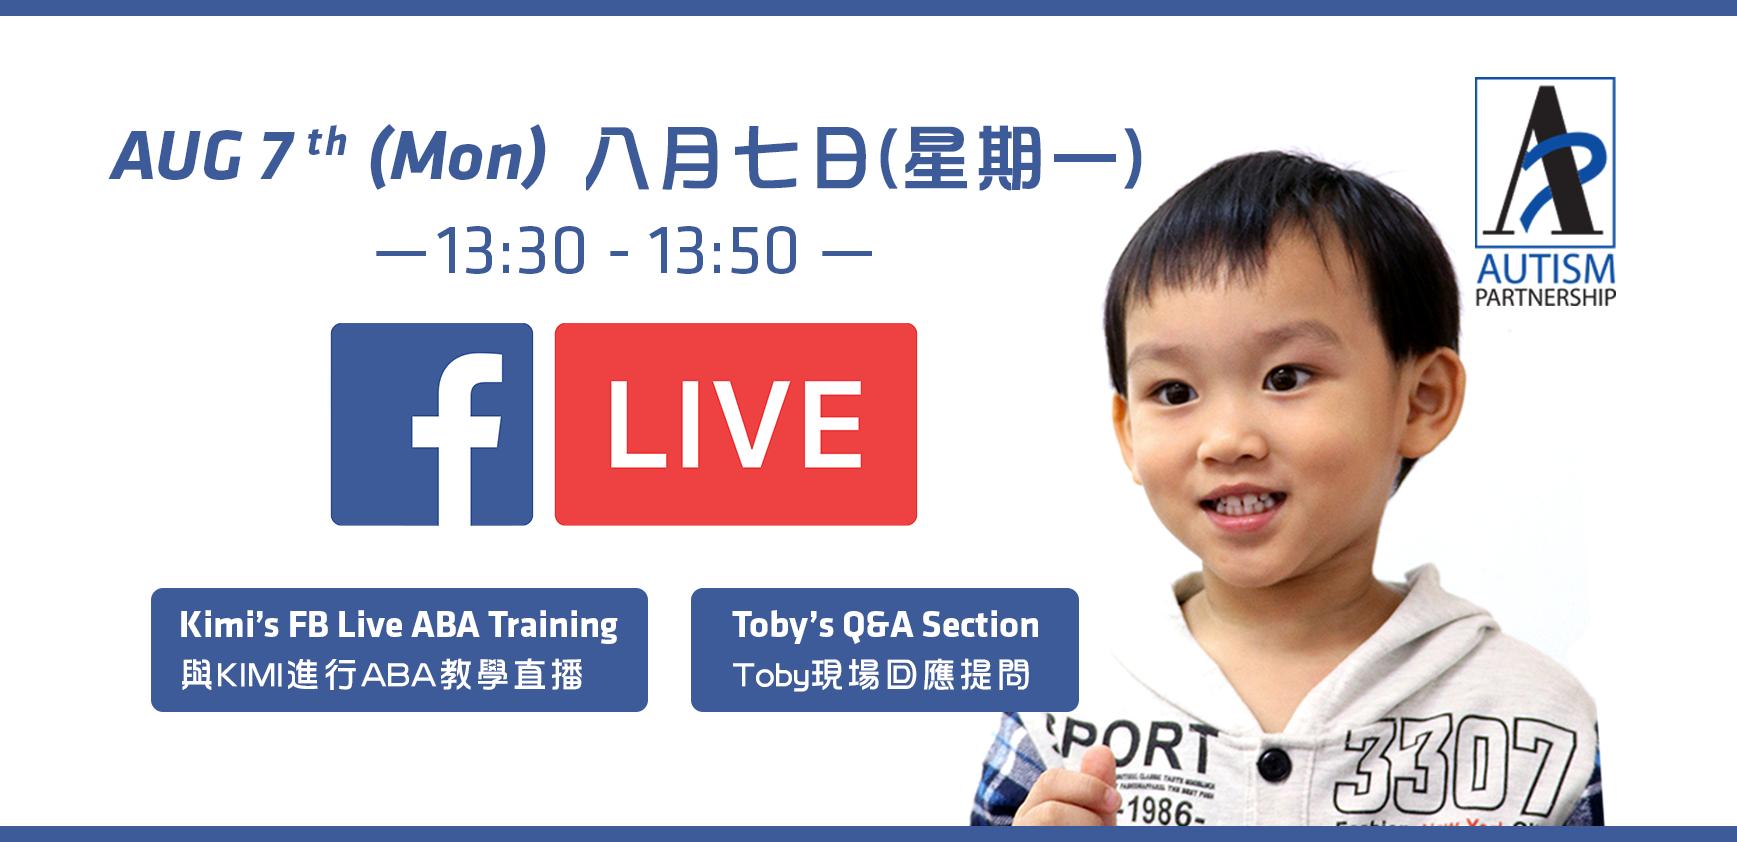 autism-partnership-kimi-facebook-live-aug-7